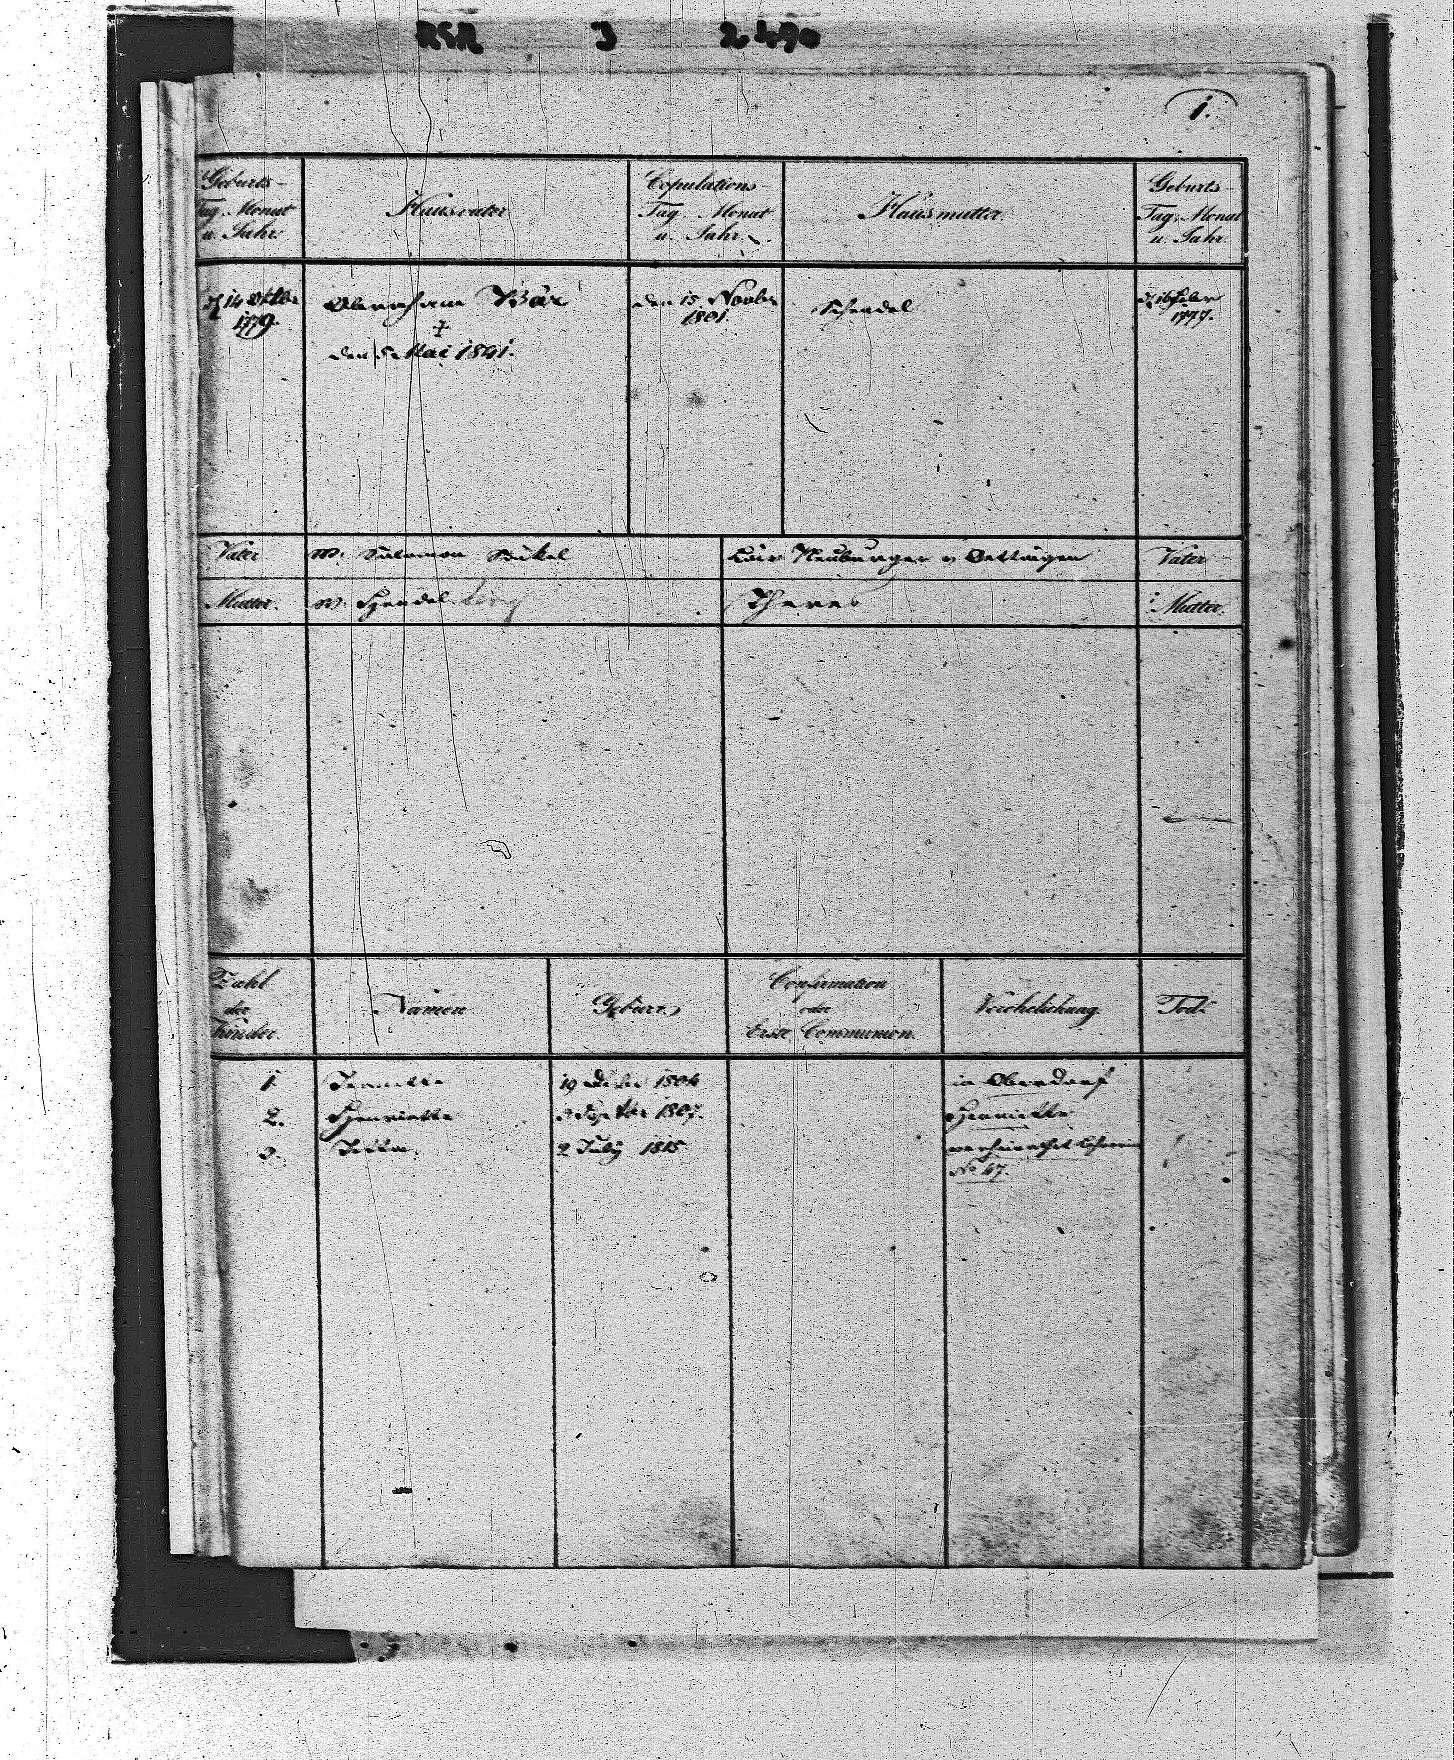 Pflaumloch, Riesbürg, Bild 1